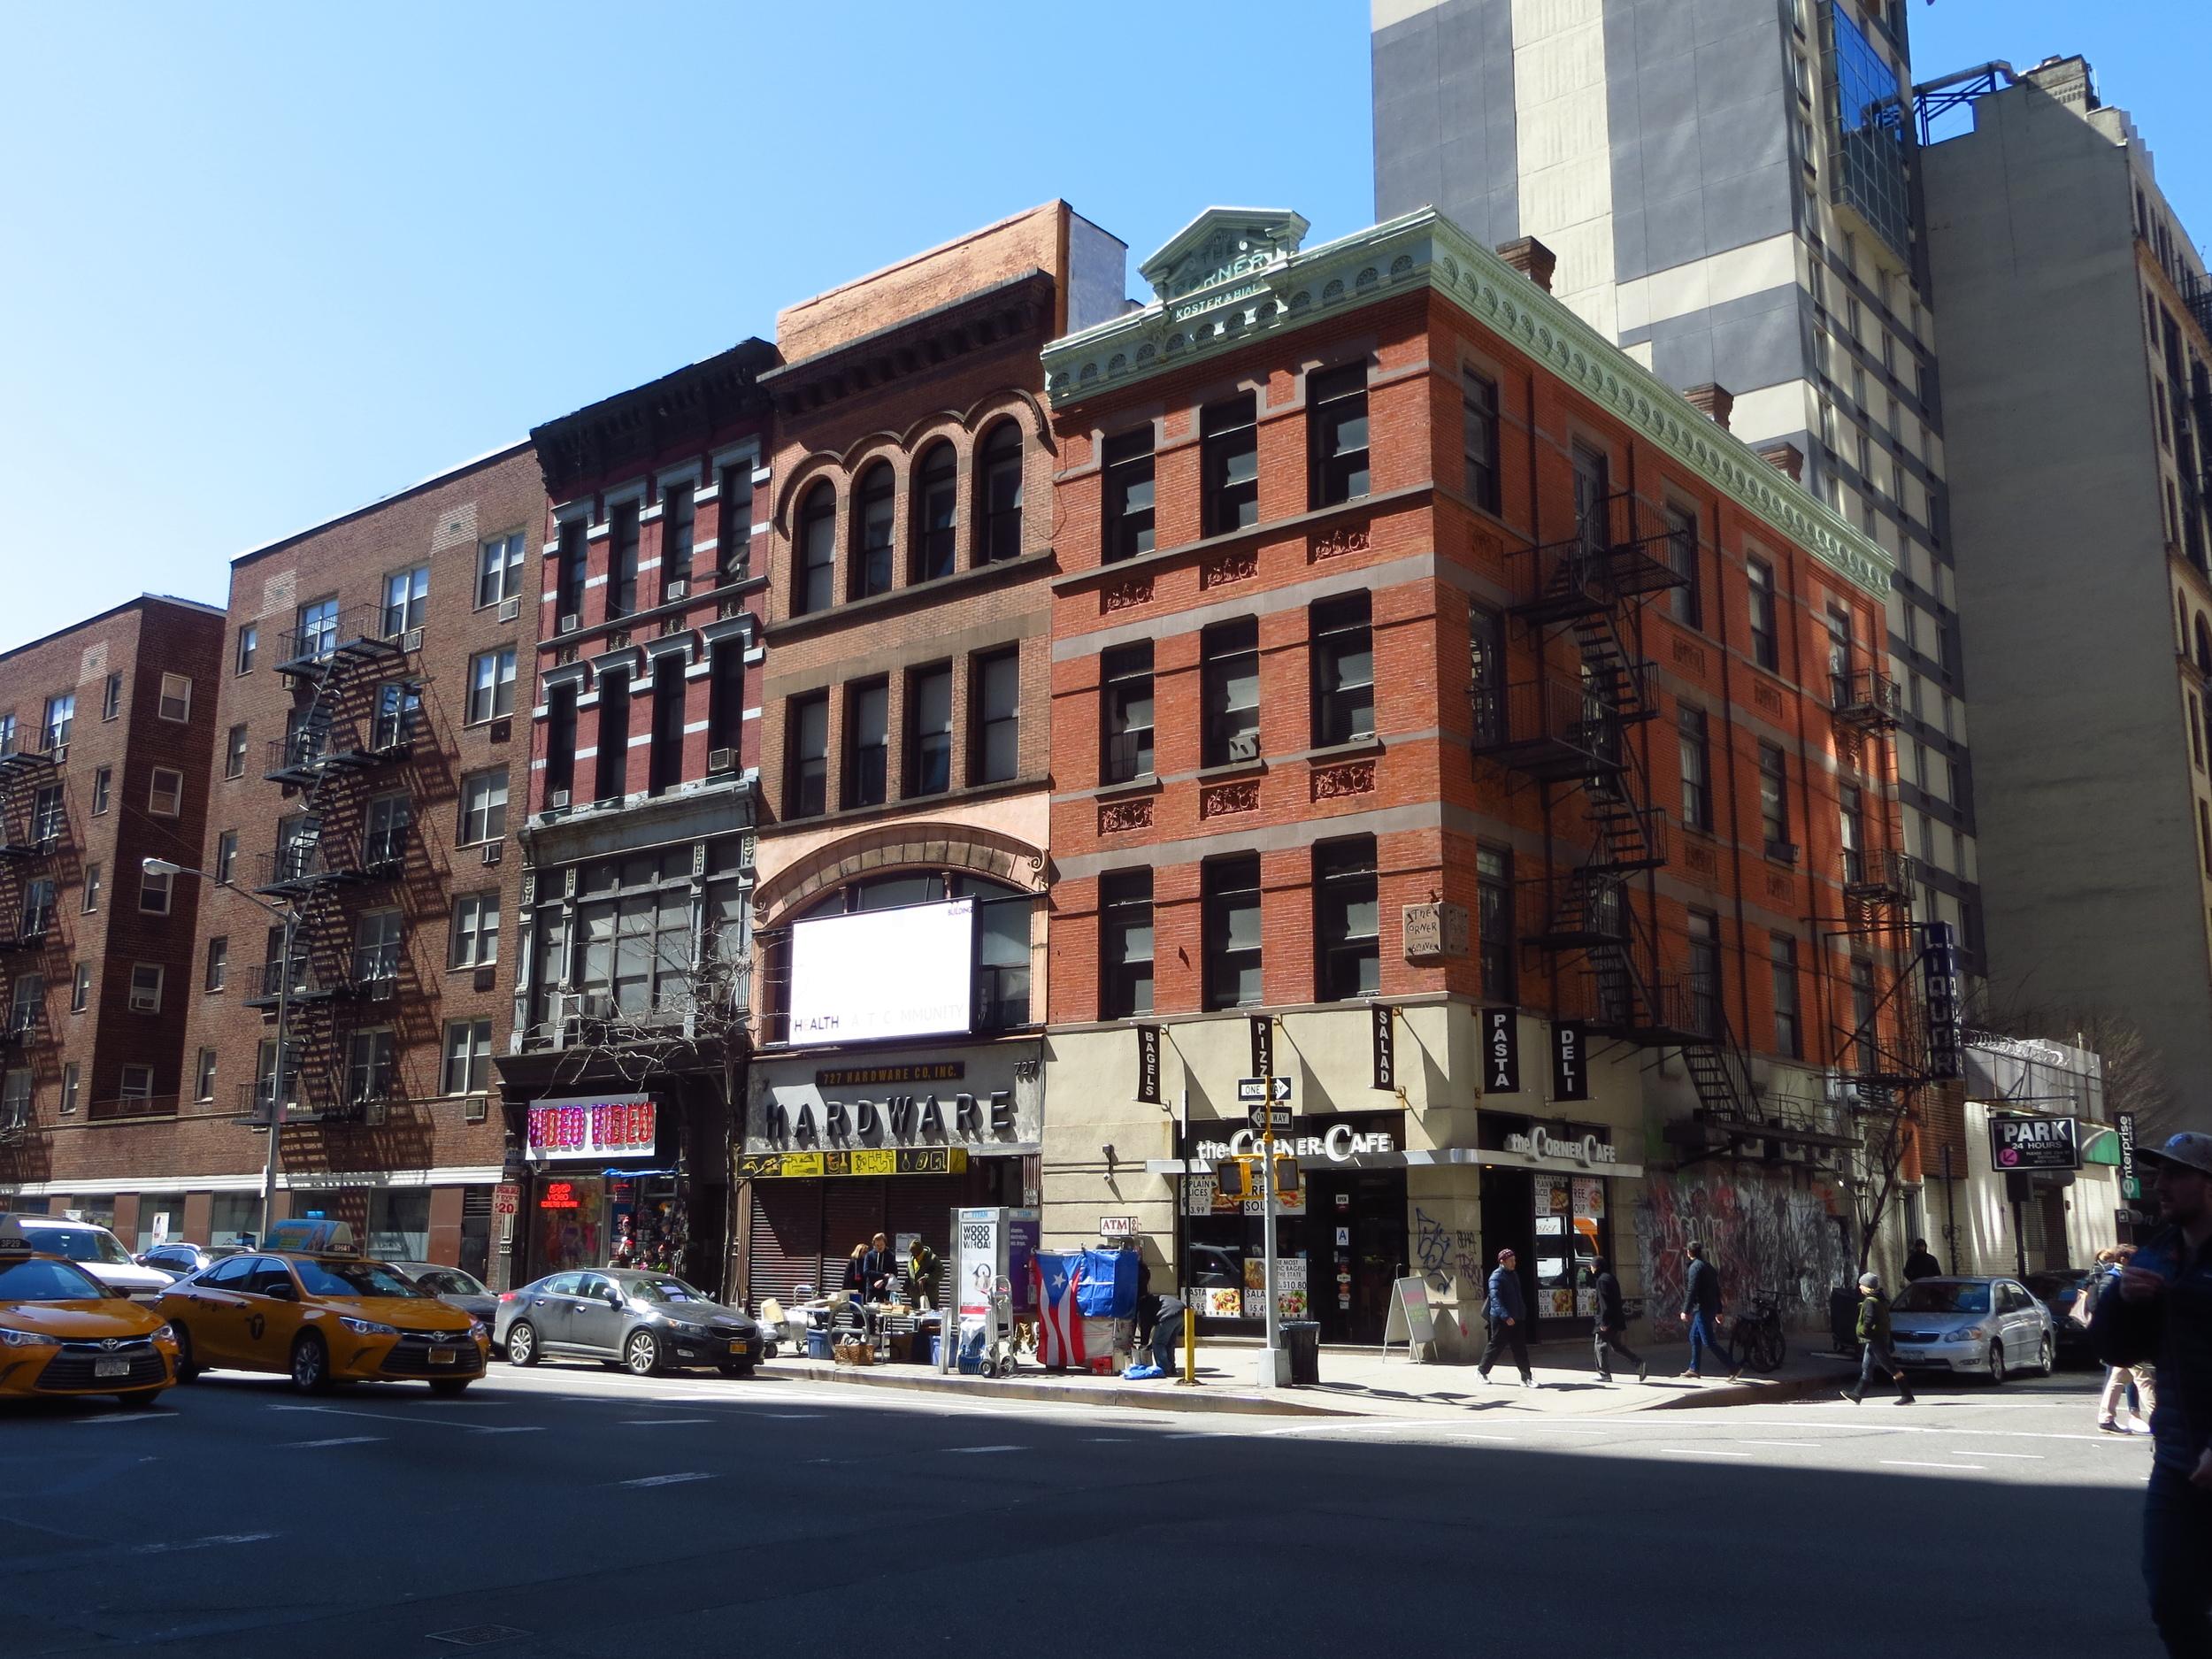 6th Ave. Street Corner